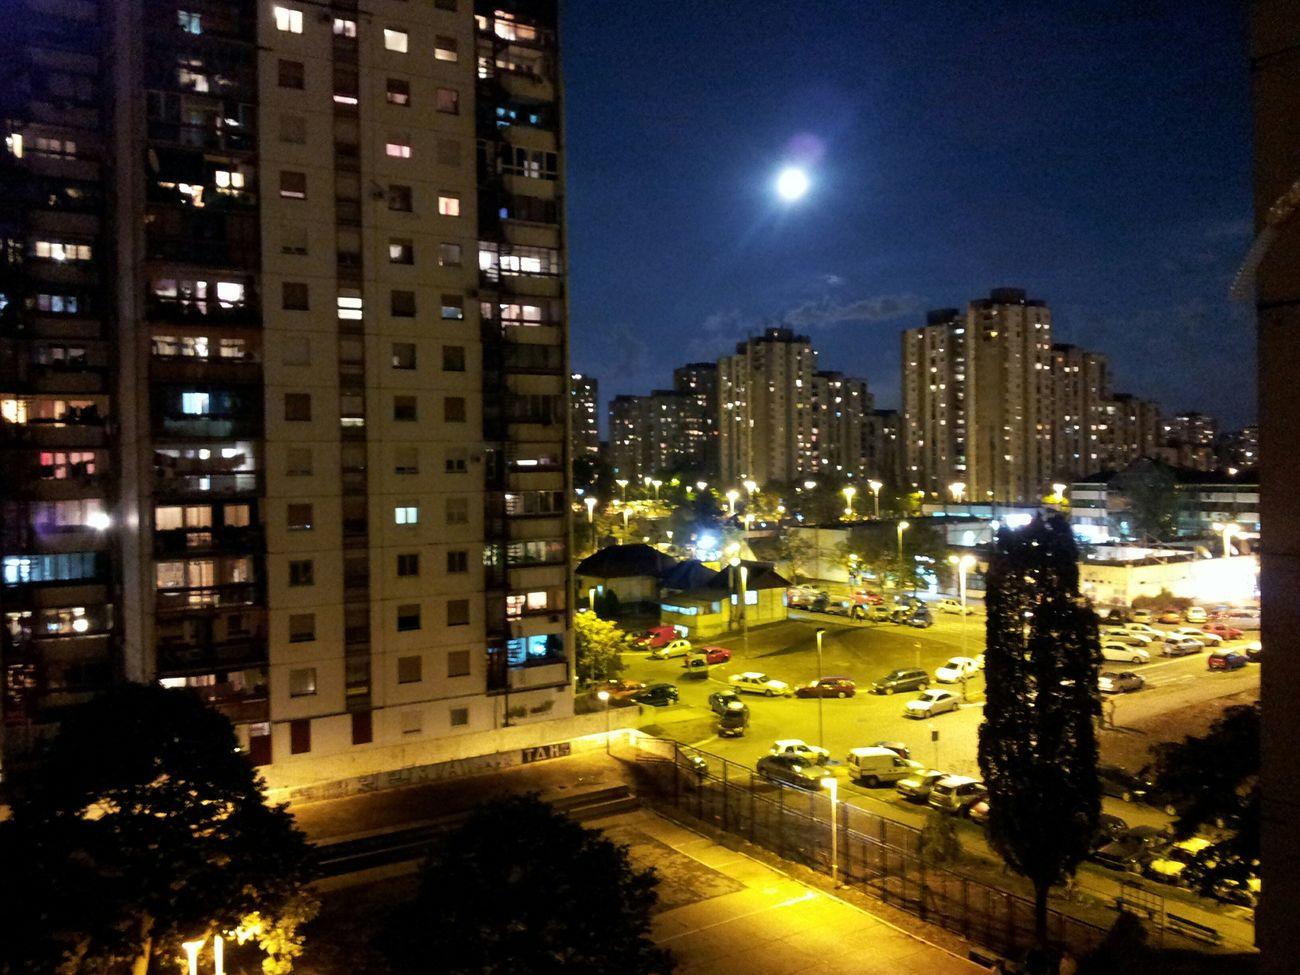 Beograd Night Lights Hello World Night Photography Moonlight Cars Steetphoto People Watching Amazing Beautiful View Belgradenight